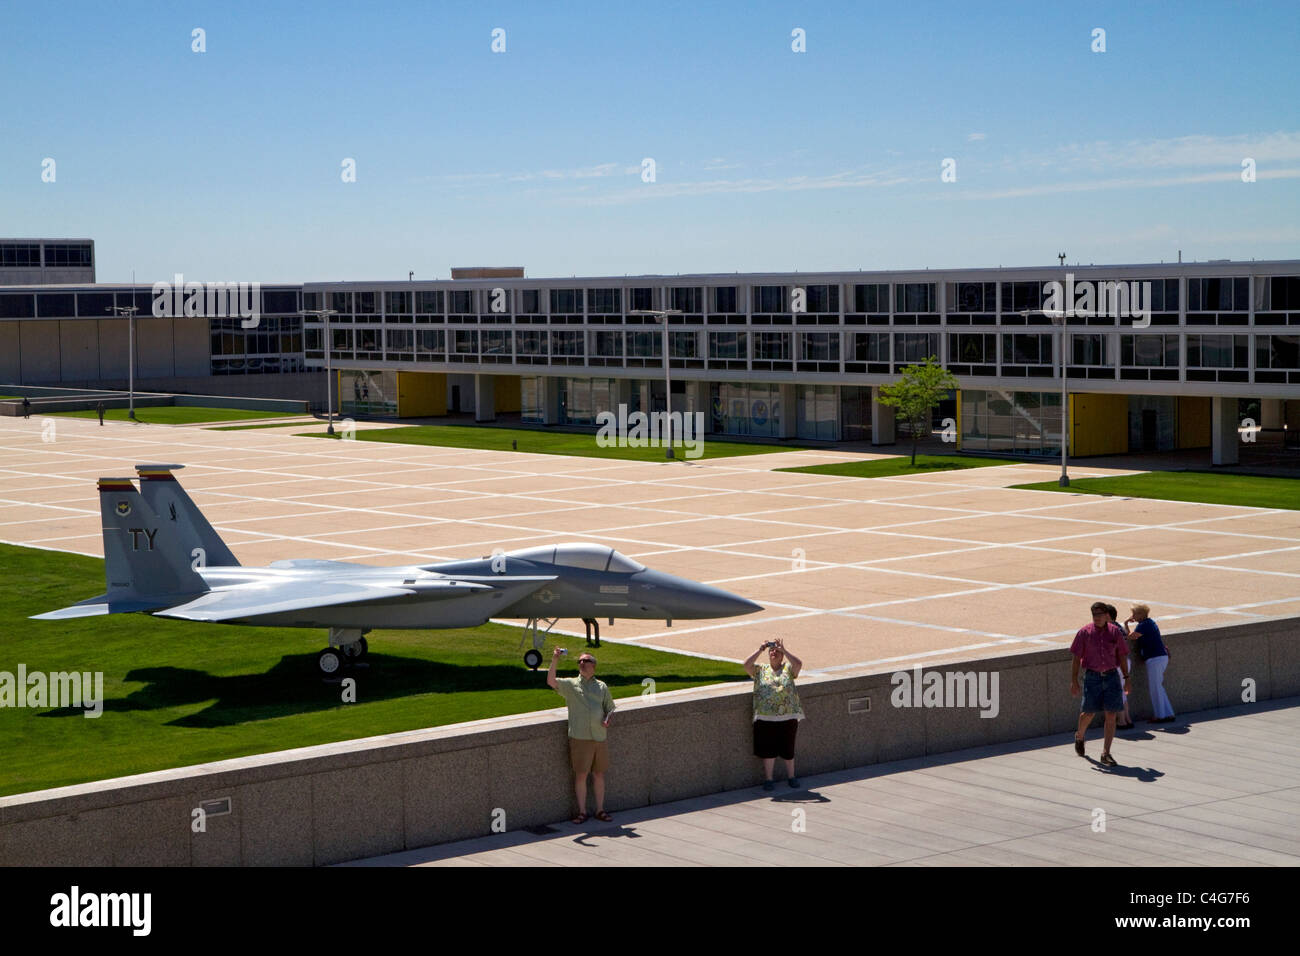 Air Force Academy in Colorado Springs, Colorado, USA. - Stock Image